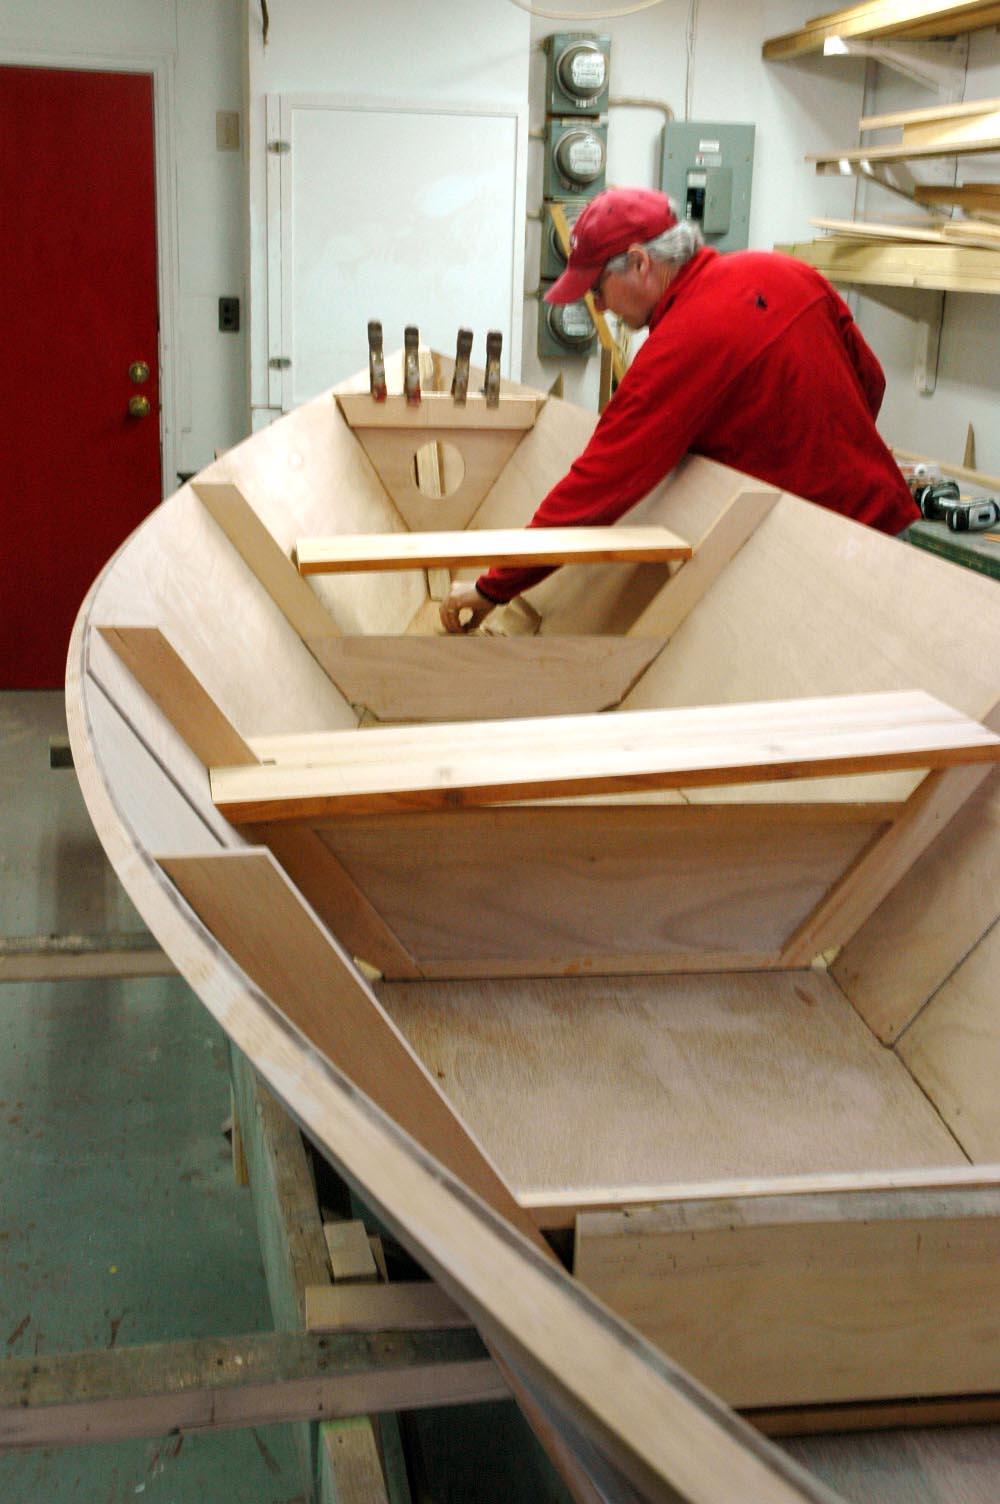 Carollza: Wooden dinghy boat kits